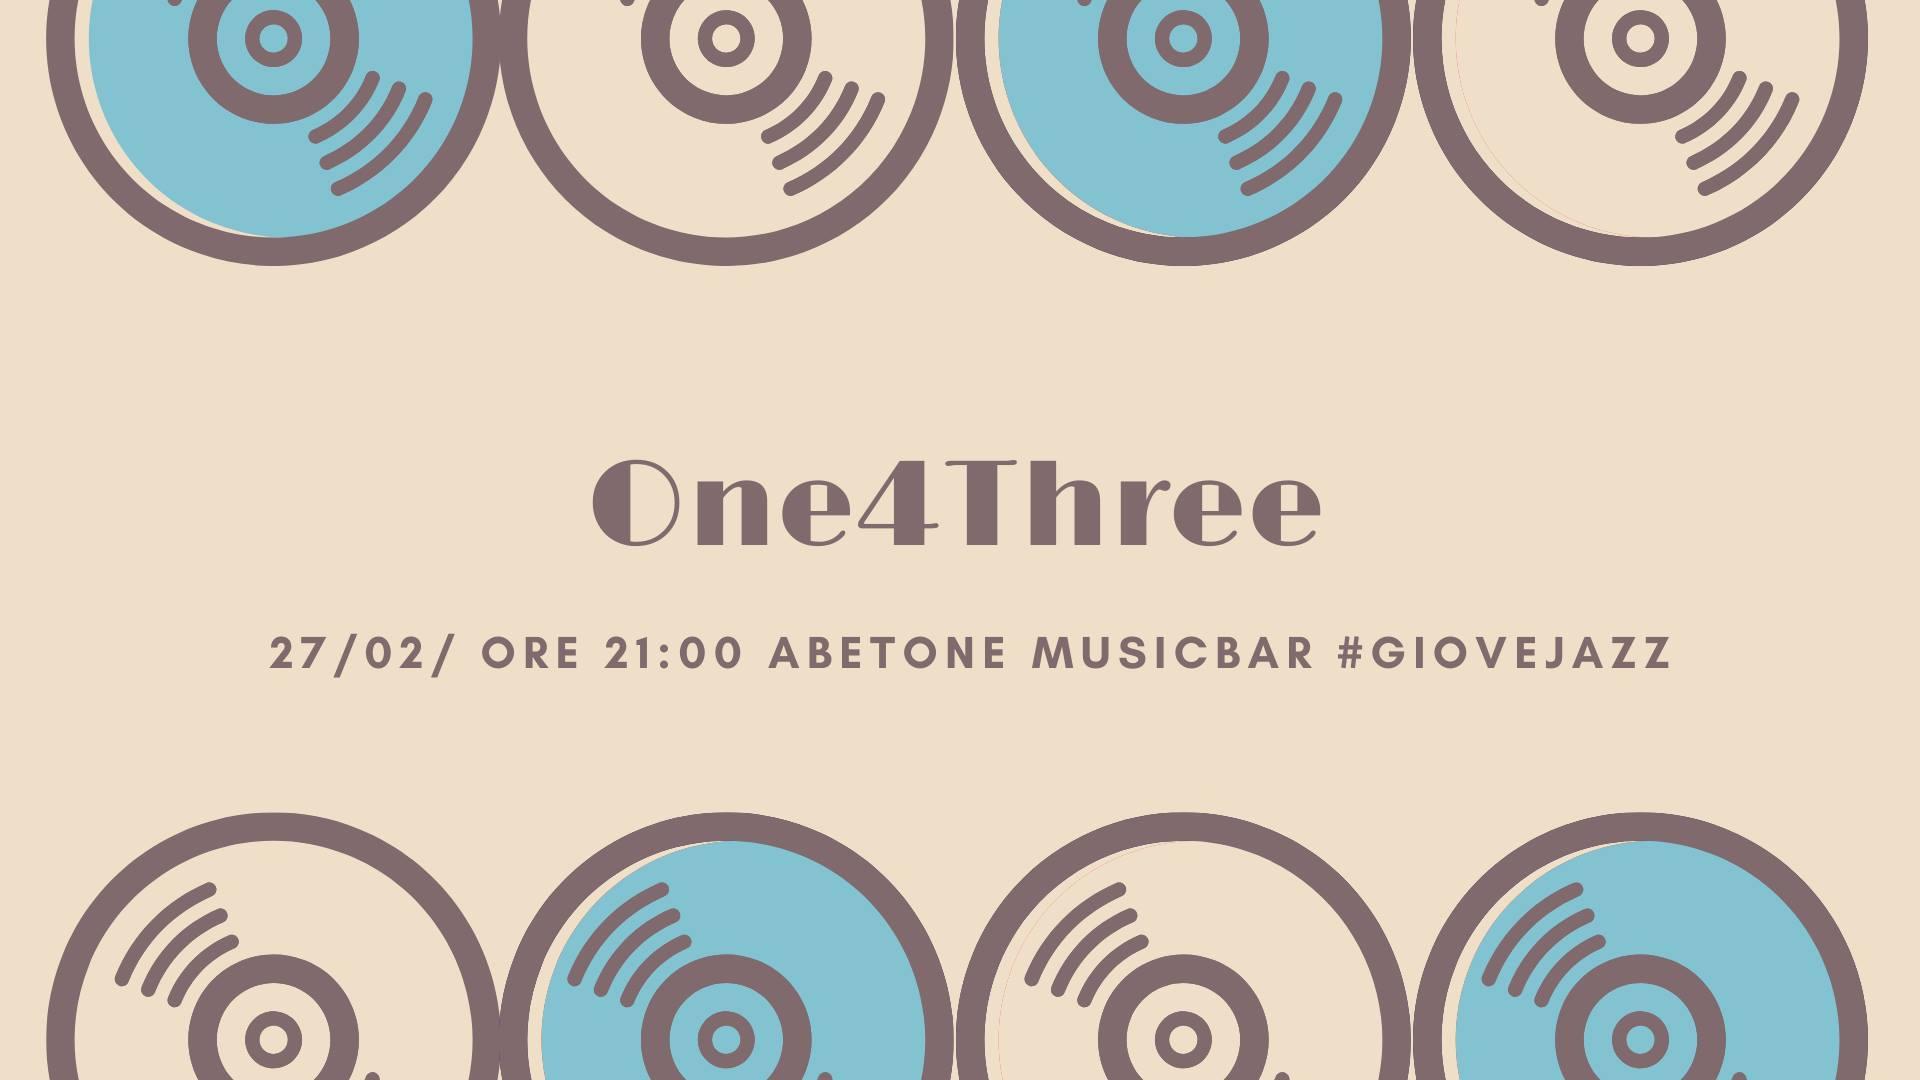 Giovejazz - One4Three - Abetone Music Bar - Sassari - 27 febbraio 2020 - eventi - 2020 - Sa Scena Sarda